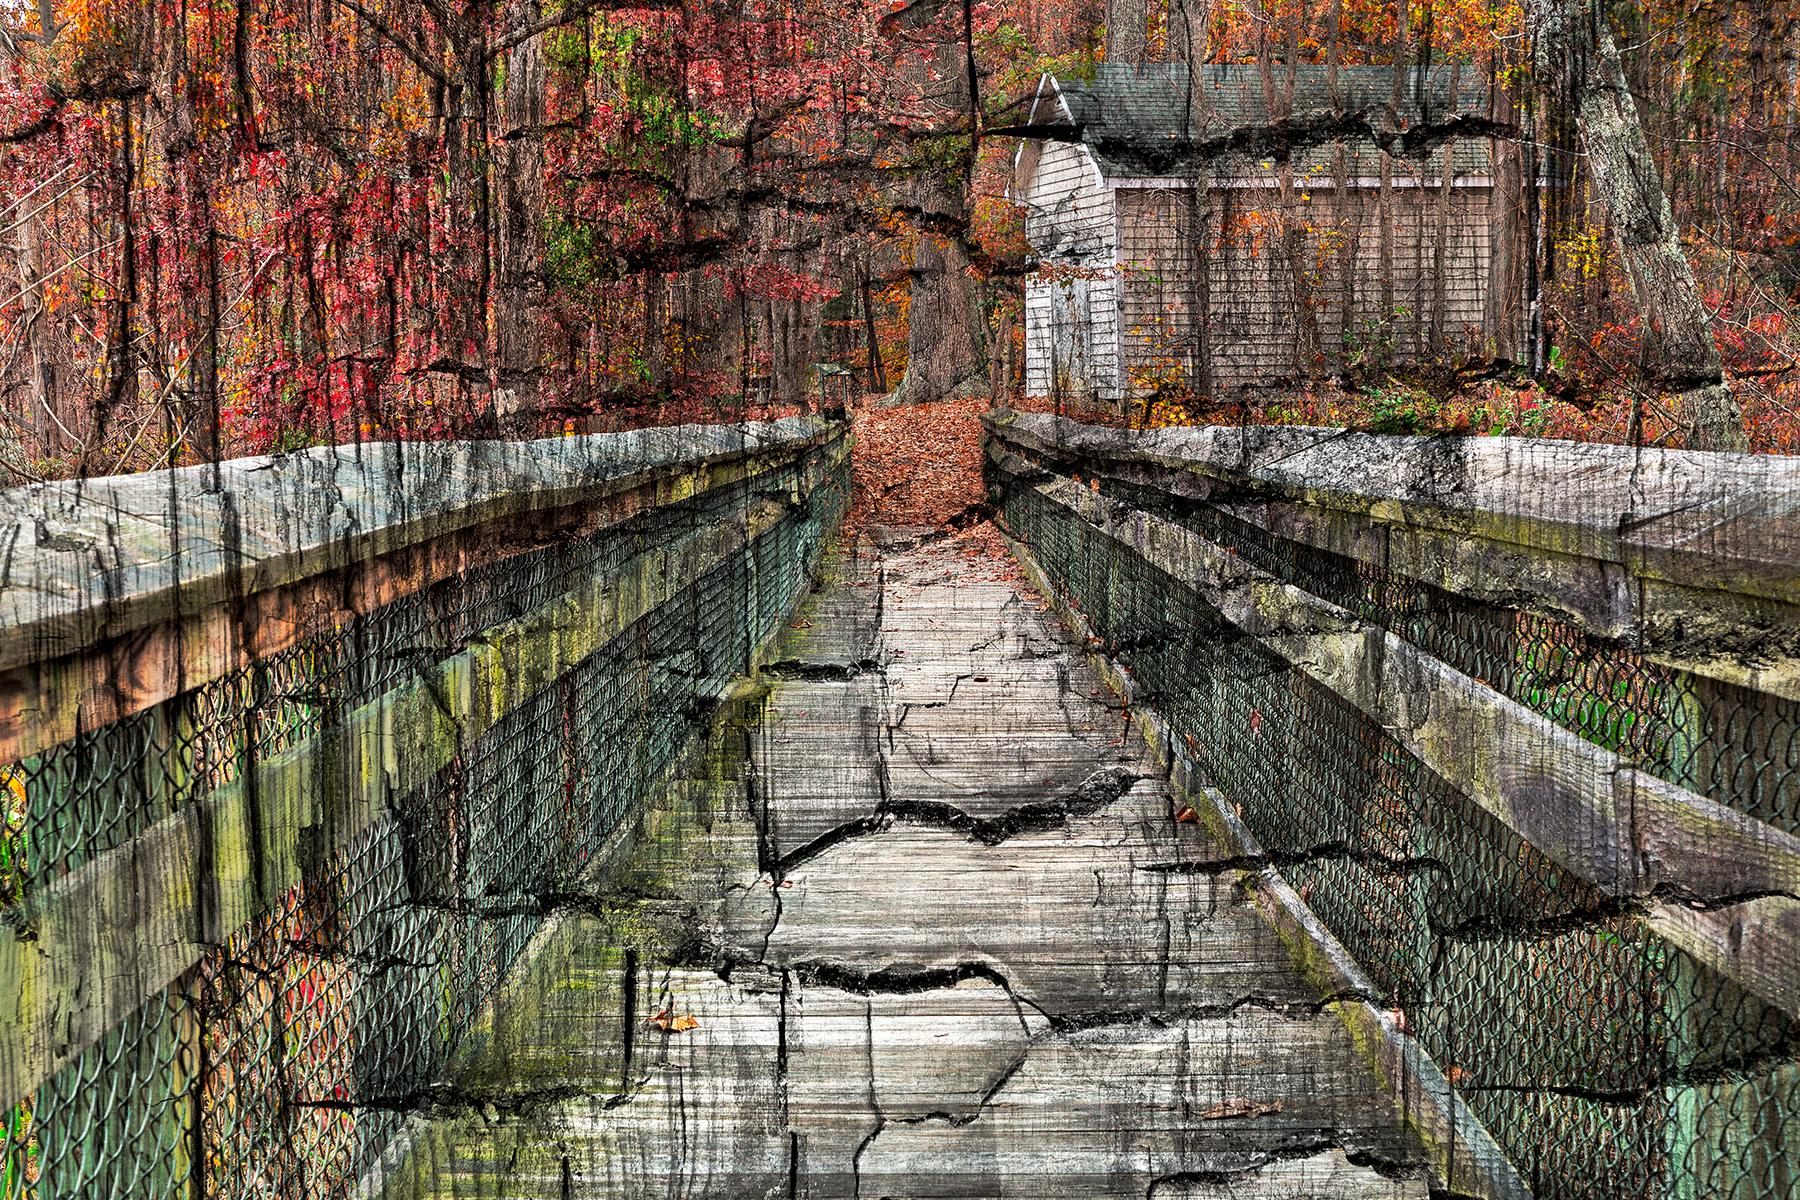 Charred Autumn Boardwalk, Age, Rail, State, Shack, HQ Photo